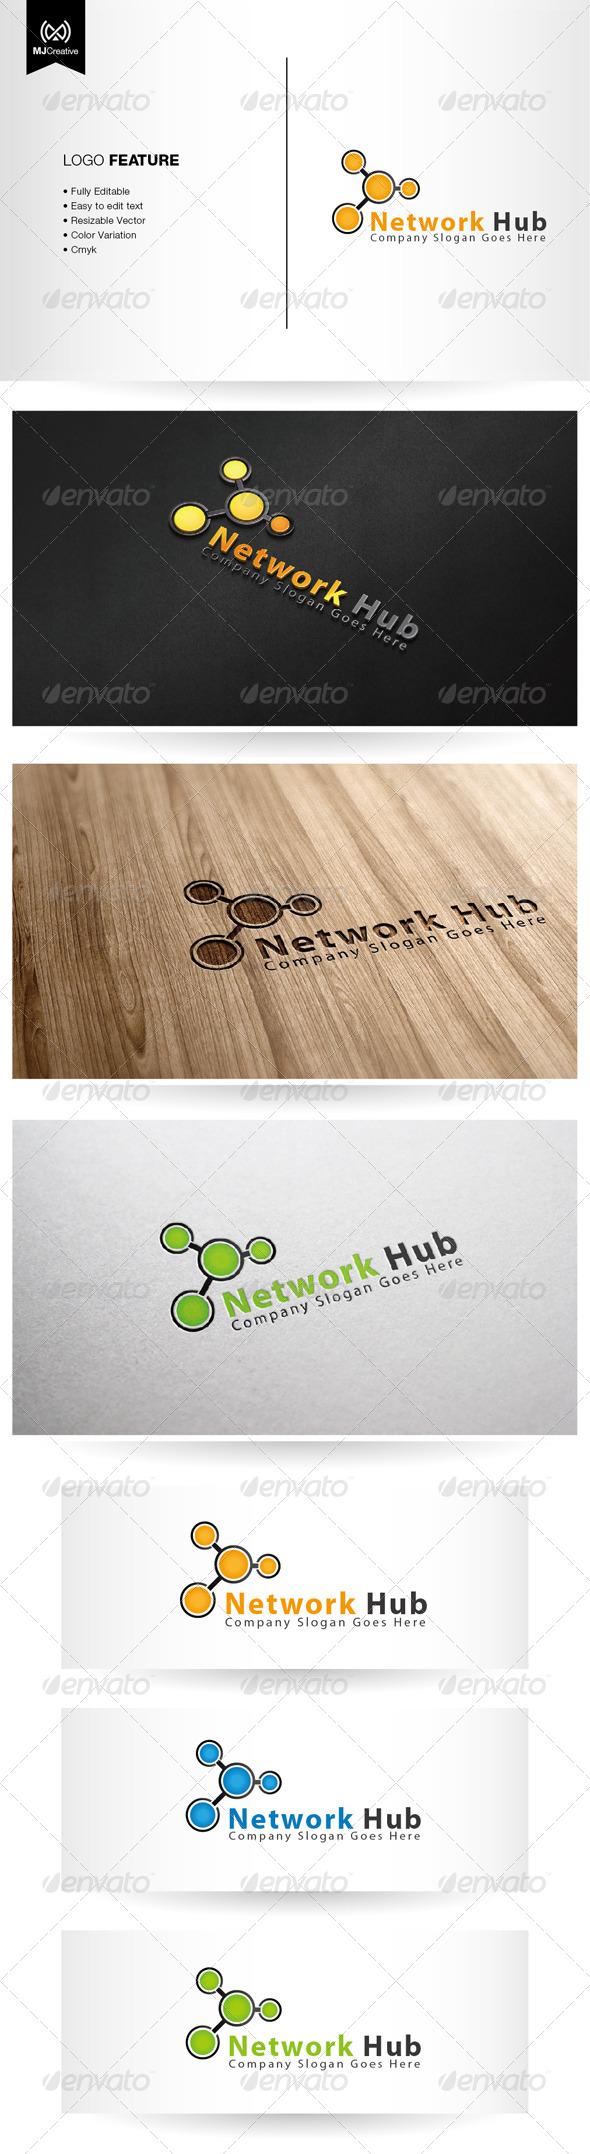 Network Hub Logo